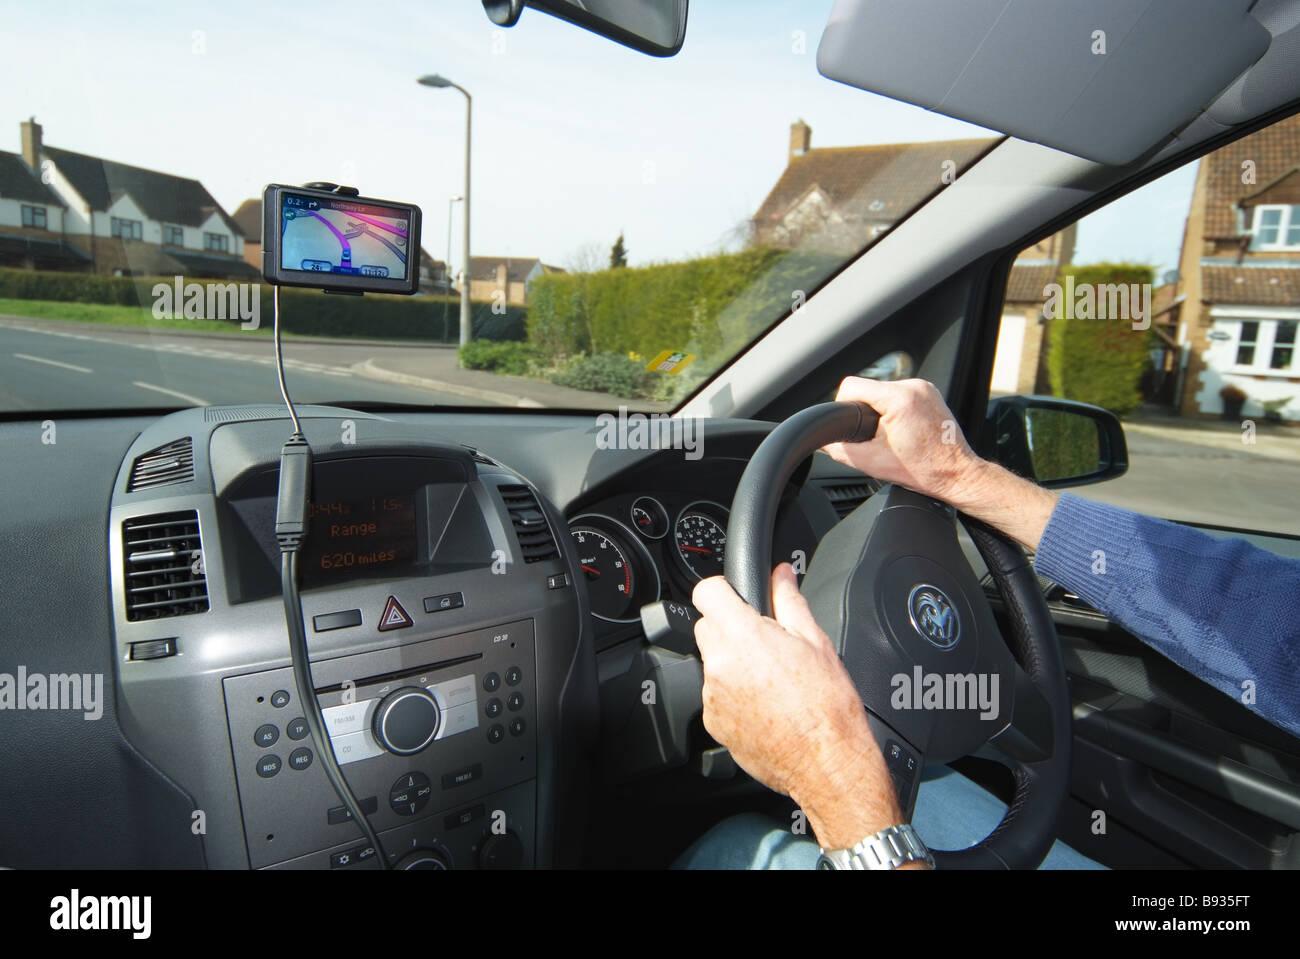 CAR DRIVER USING SATELLITE NAVIGATION EQUIPMENT - Stock Image